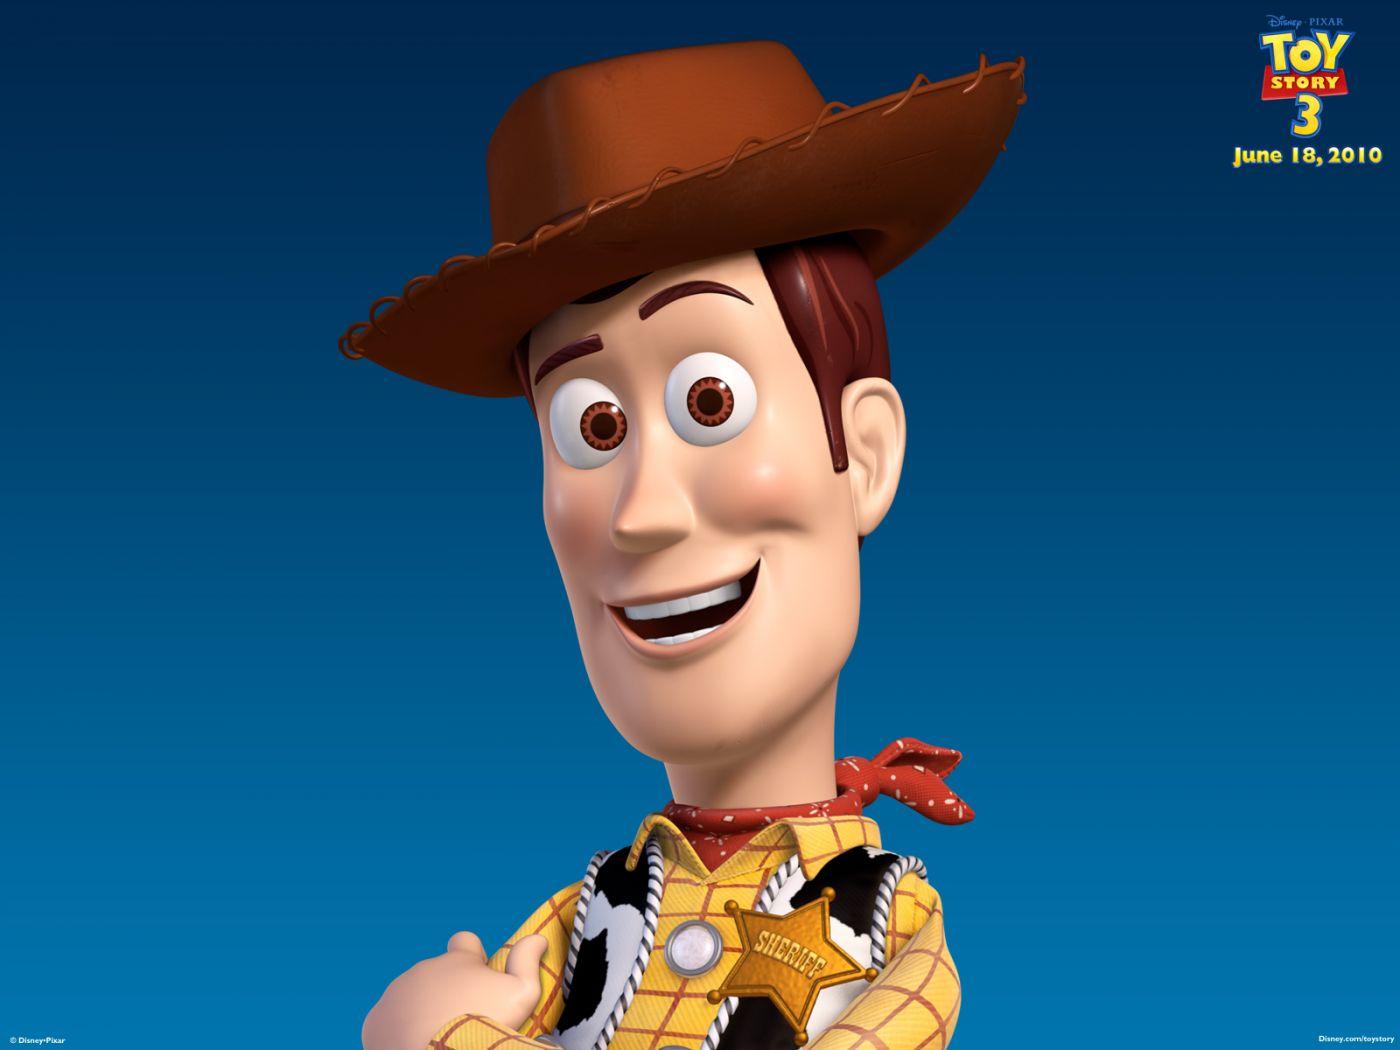 Woody Headshot Toy Story 3 Wallpaper 1400x1050